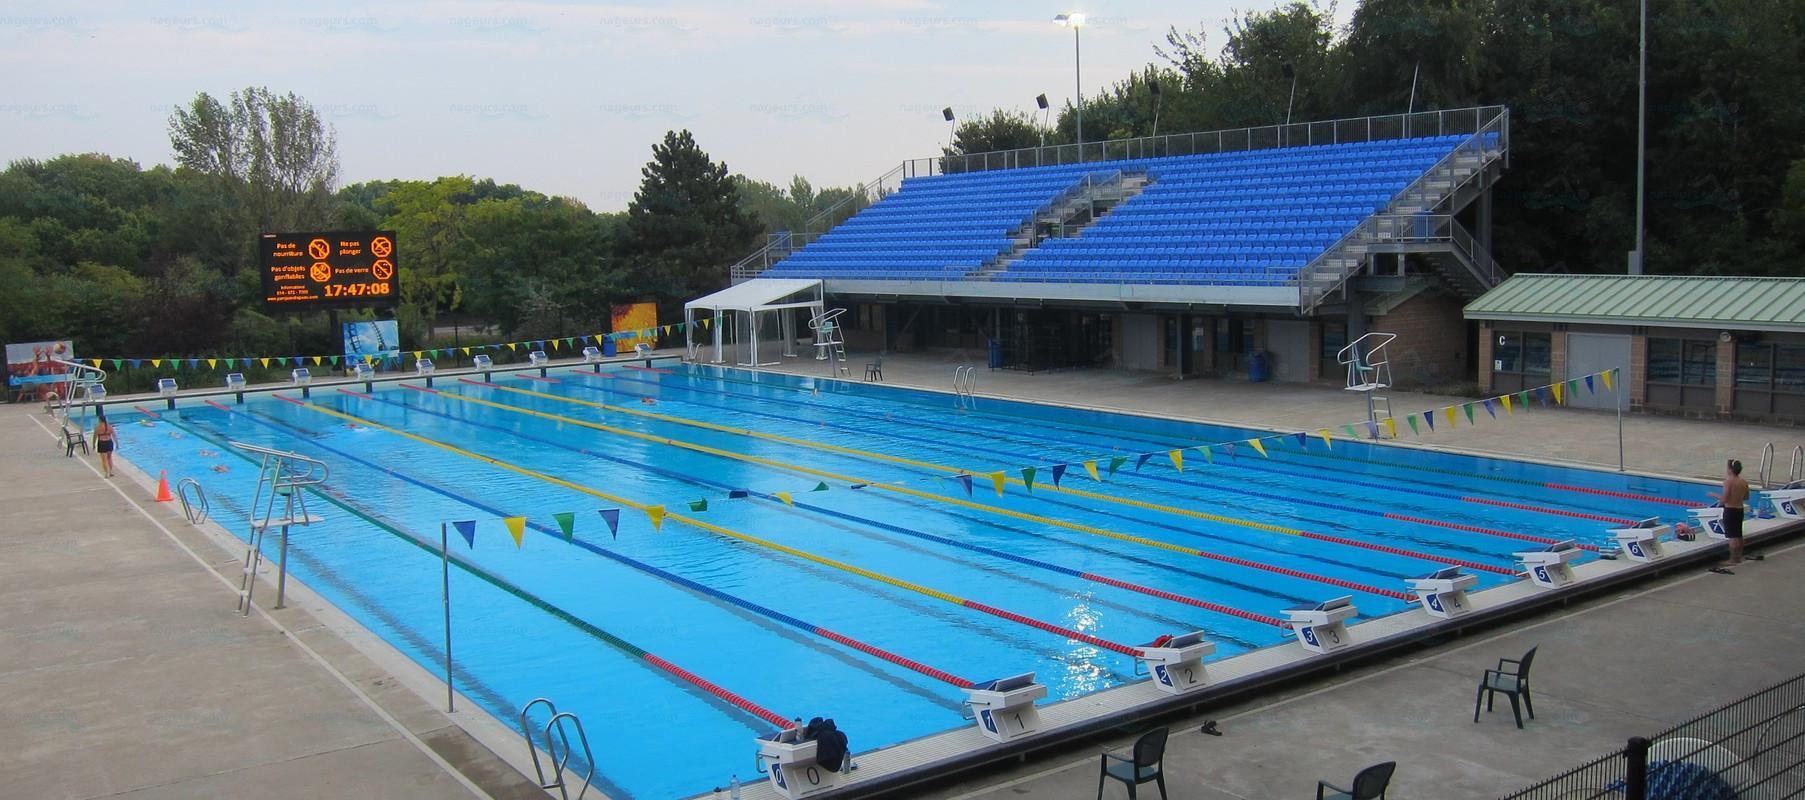 D coration piscine municipale montreal 21 paris stade - Piscine municipale hyeres ...